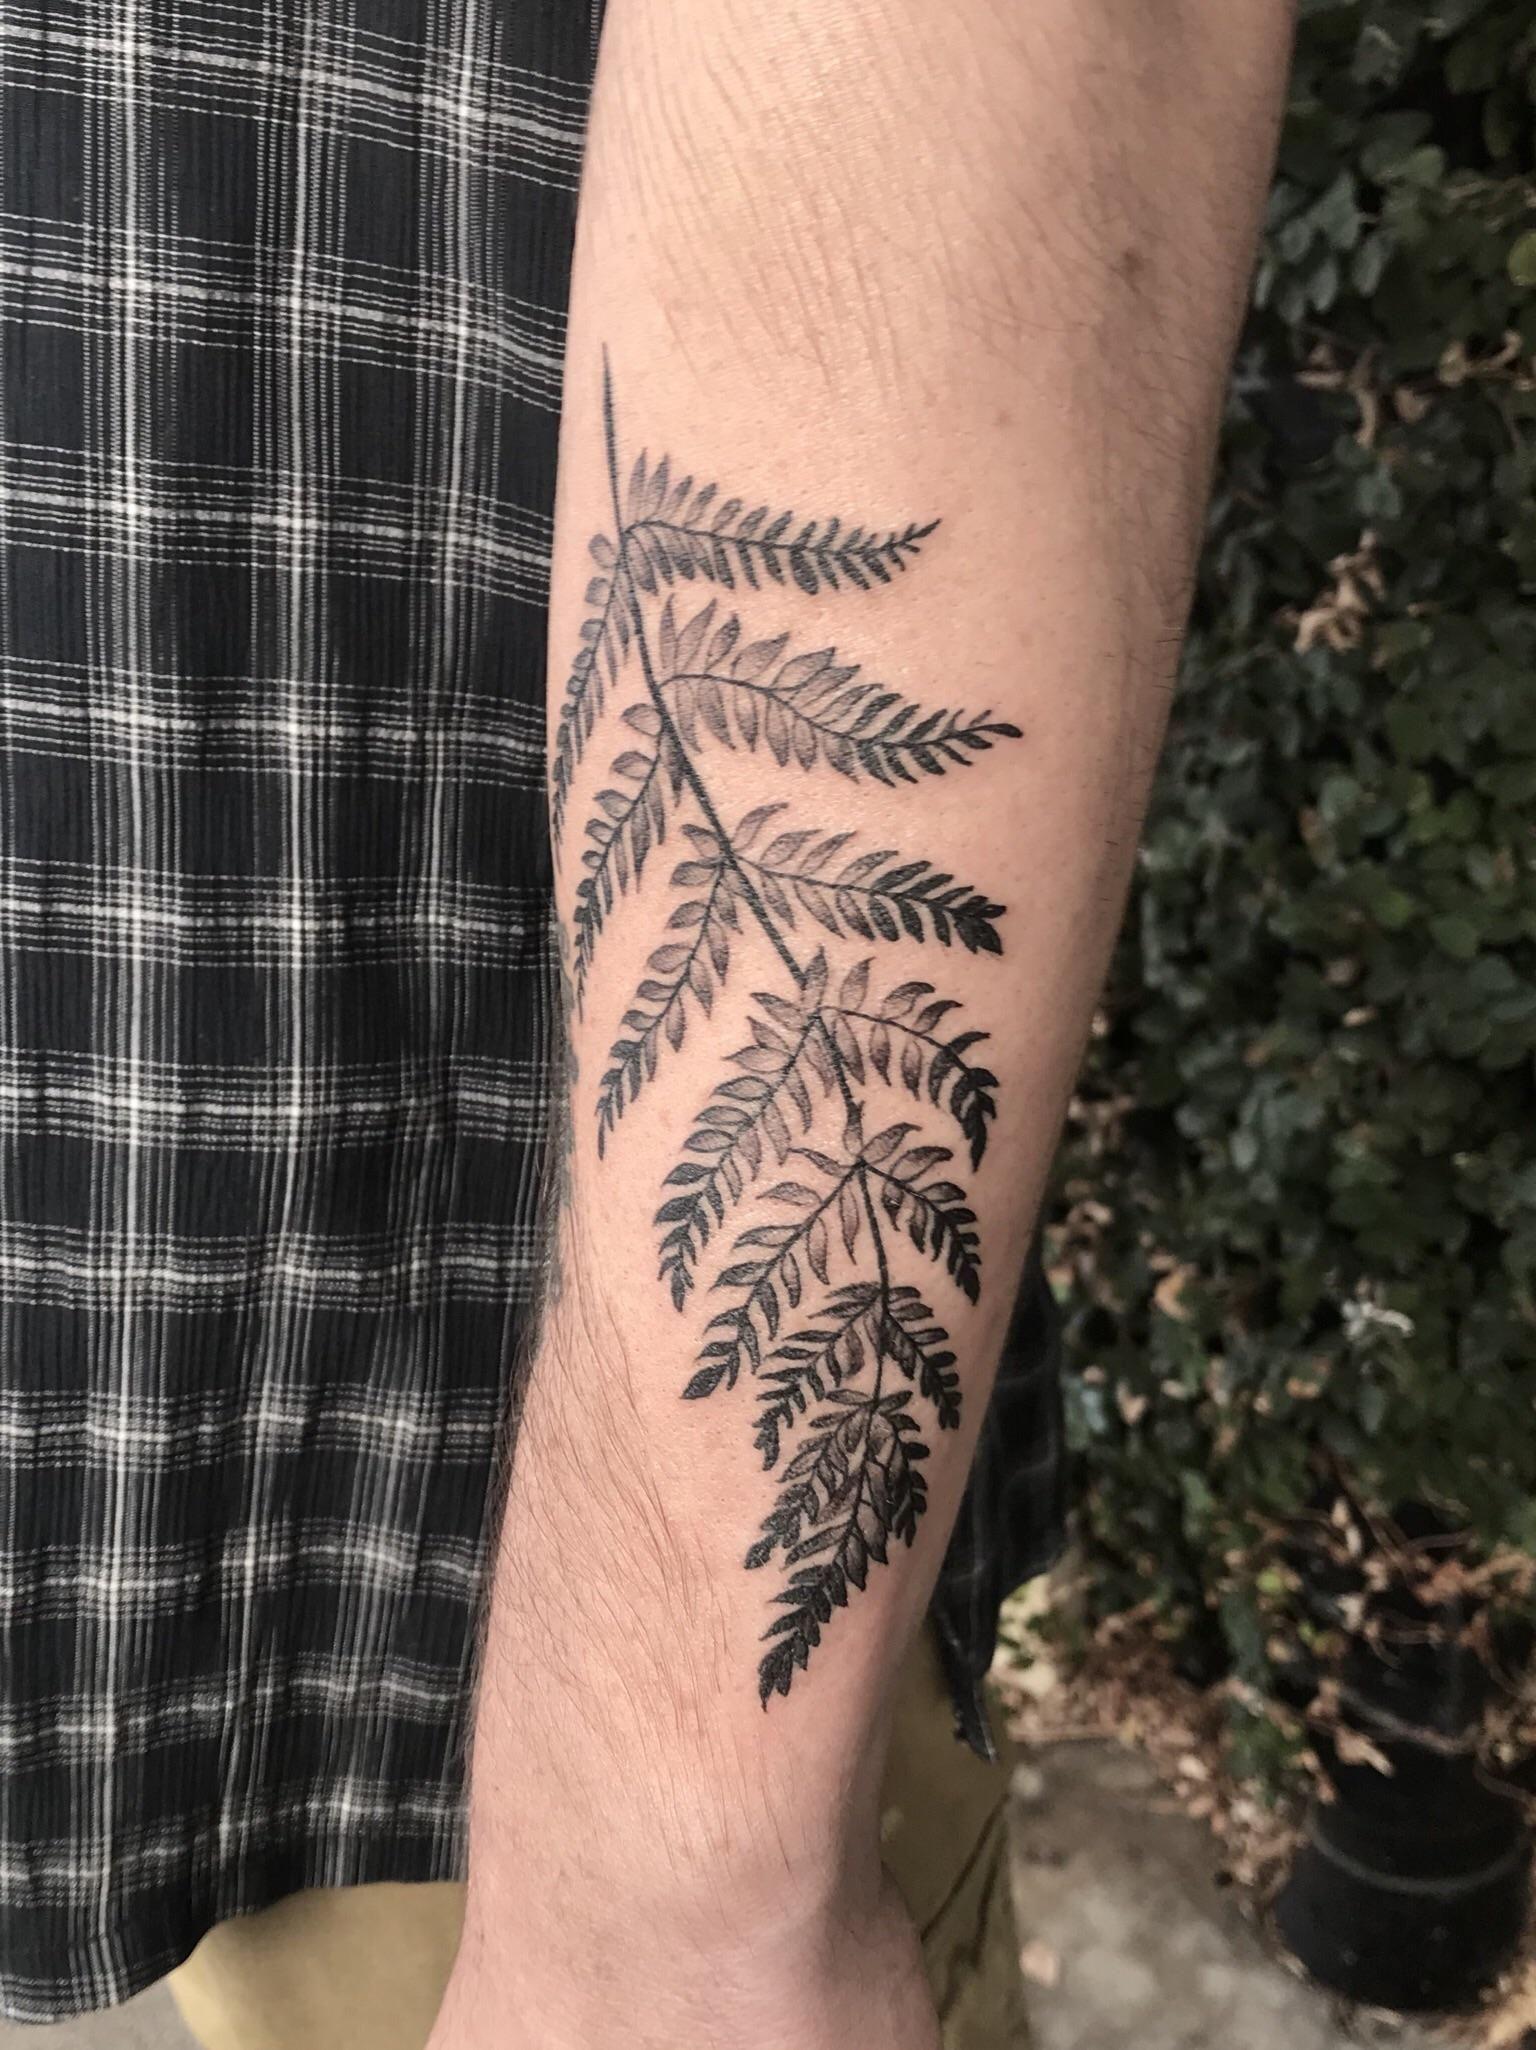 Diytattootemporary Fingertattoo Serpenttattoo Tattoosformen In 2020 Serpent Tattoo Melbourne Tattoo Tattoos